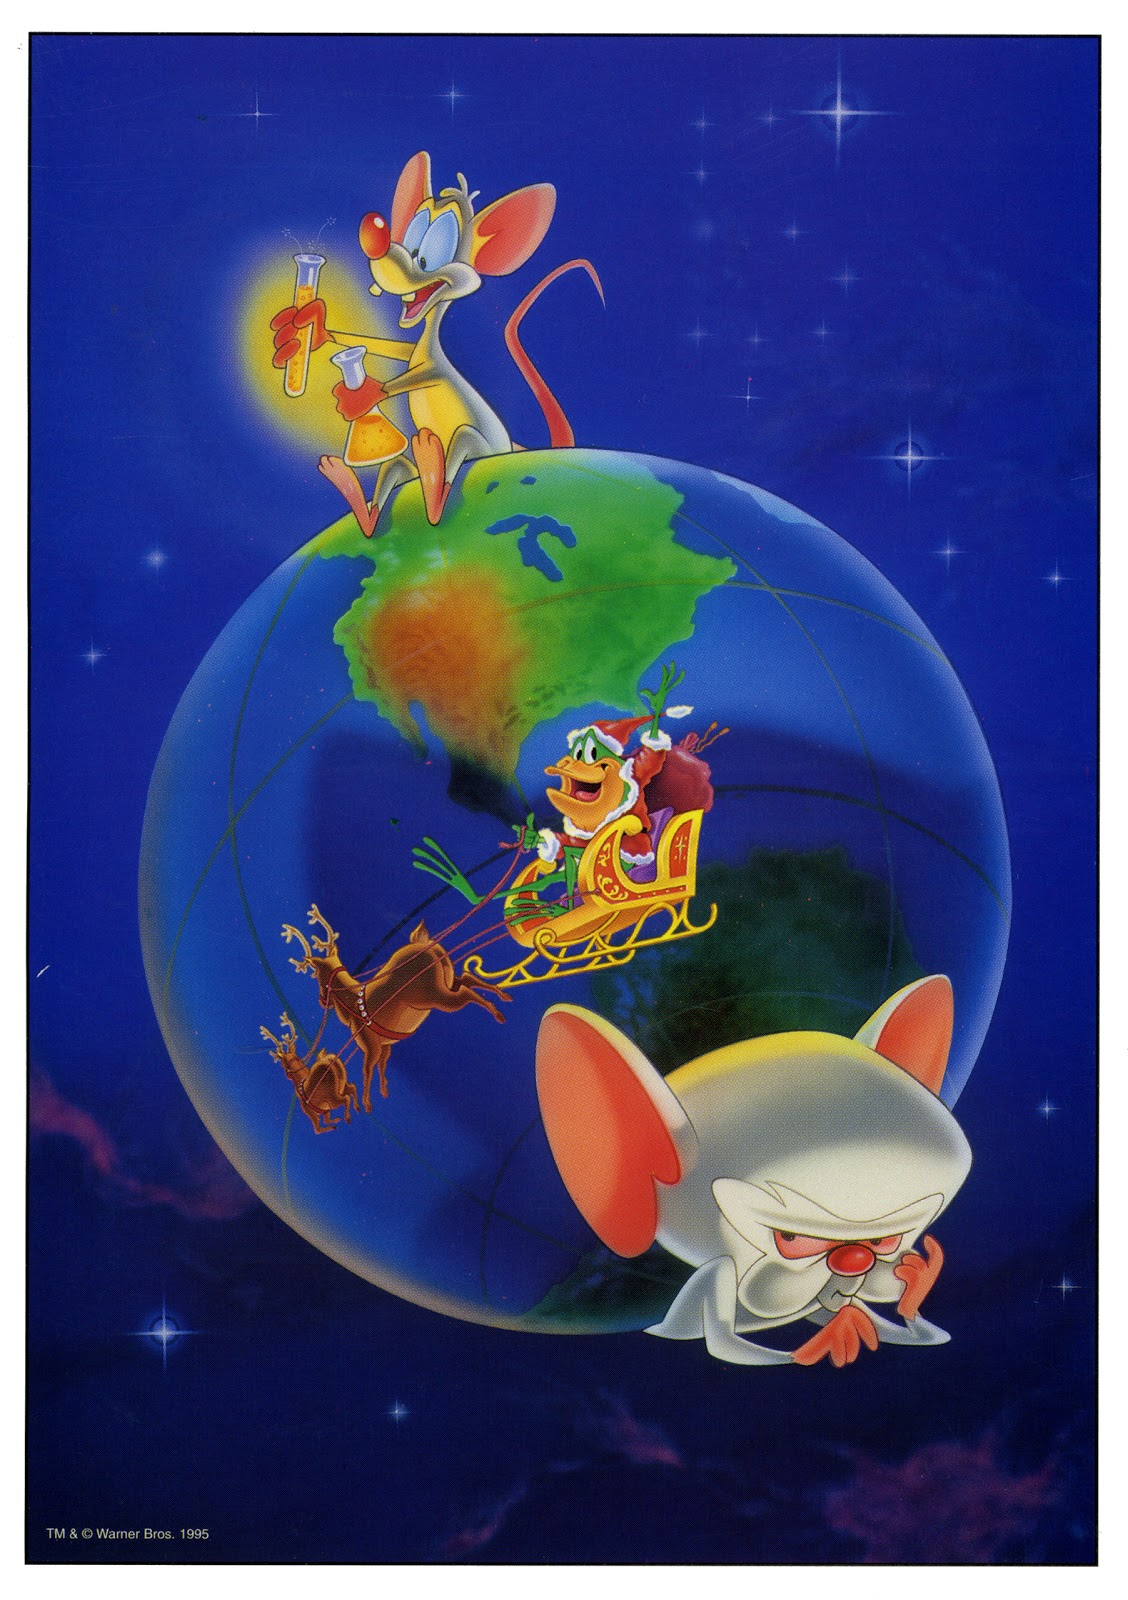 Cartoonatics: Pinky and the Brain Christmas Card